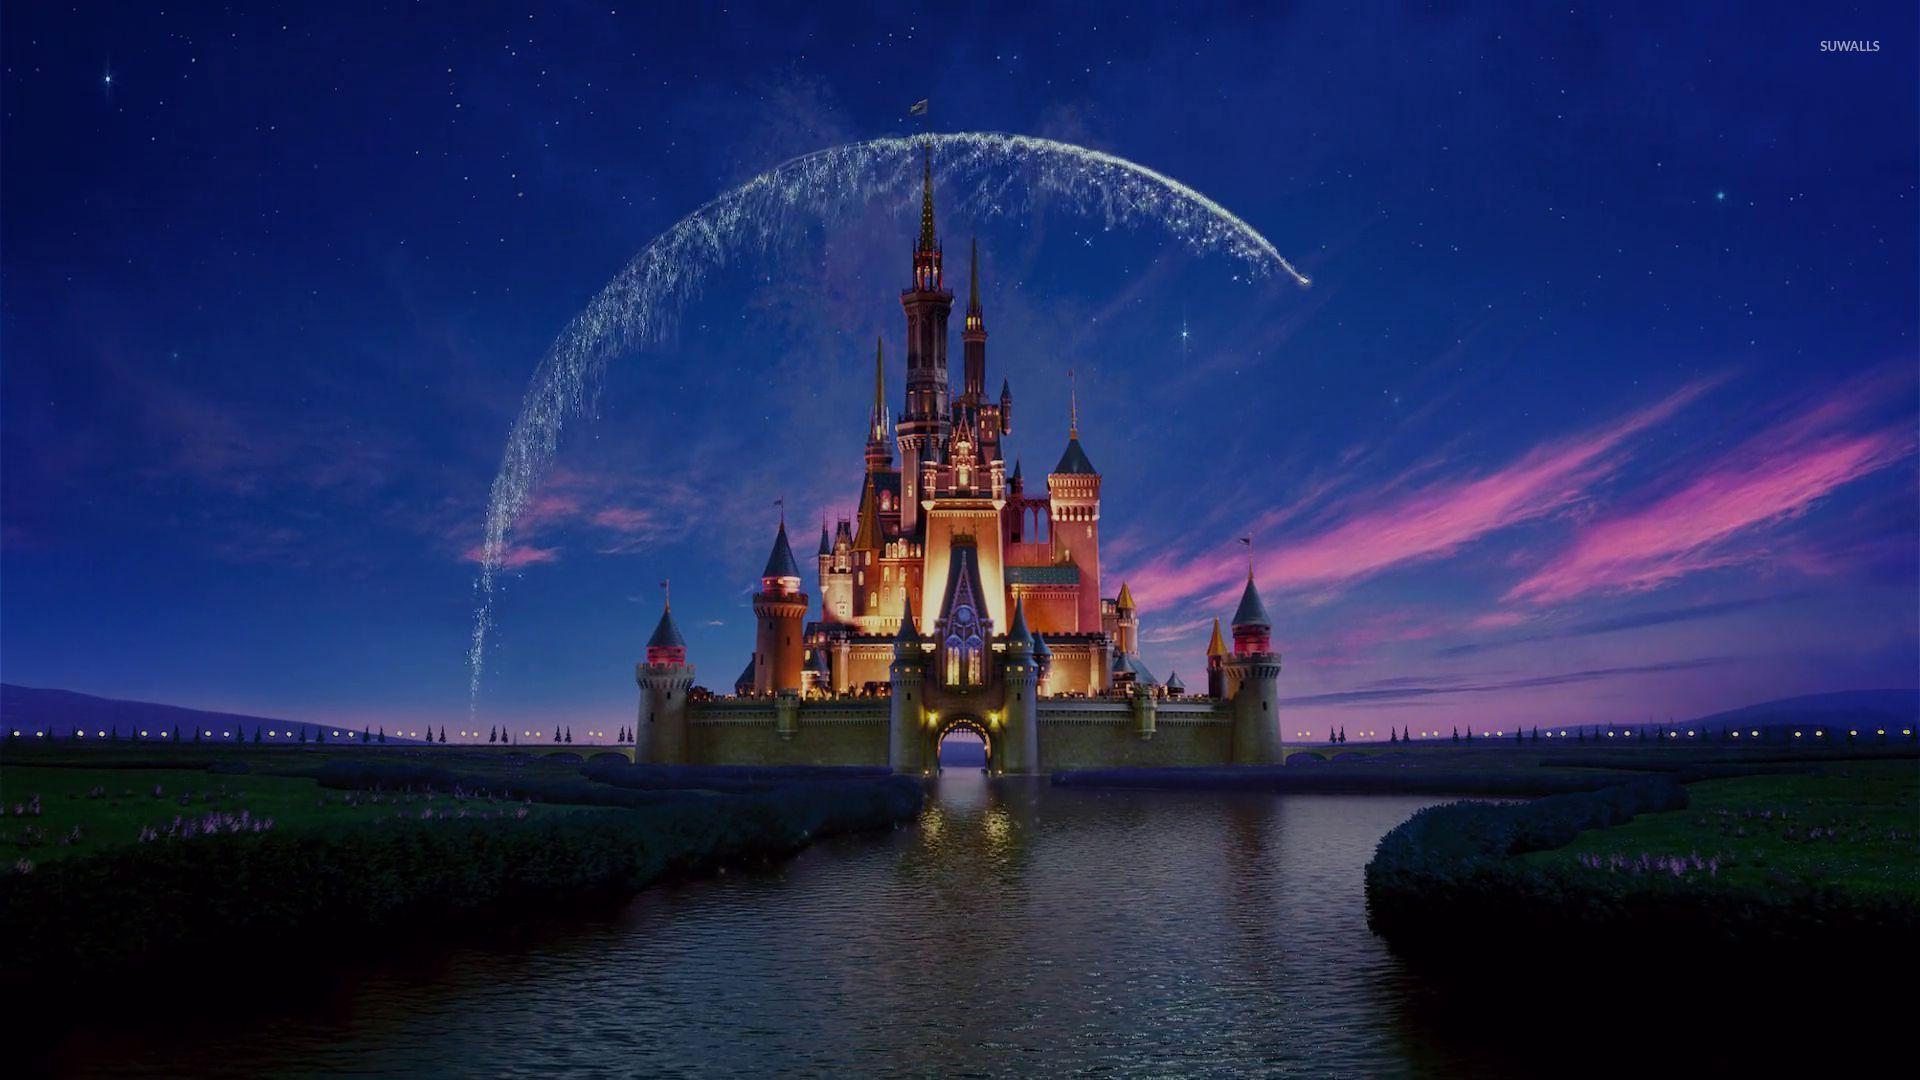 Disney 1920x1080 Hd Wallpapers Top Free Disney 1920x1080 Hd Backgrounds Wallpaperaccess